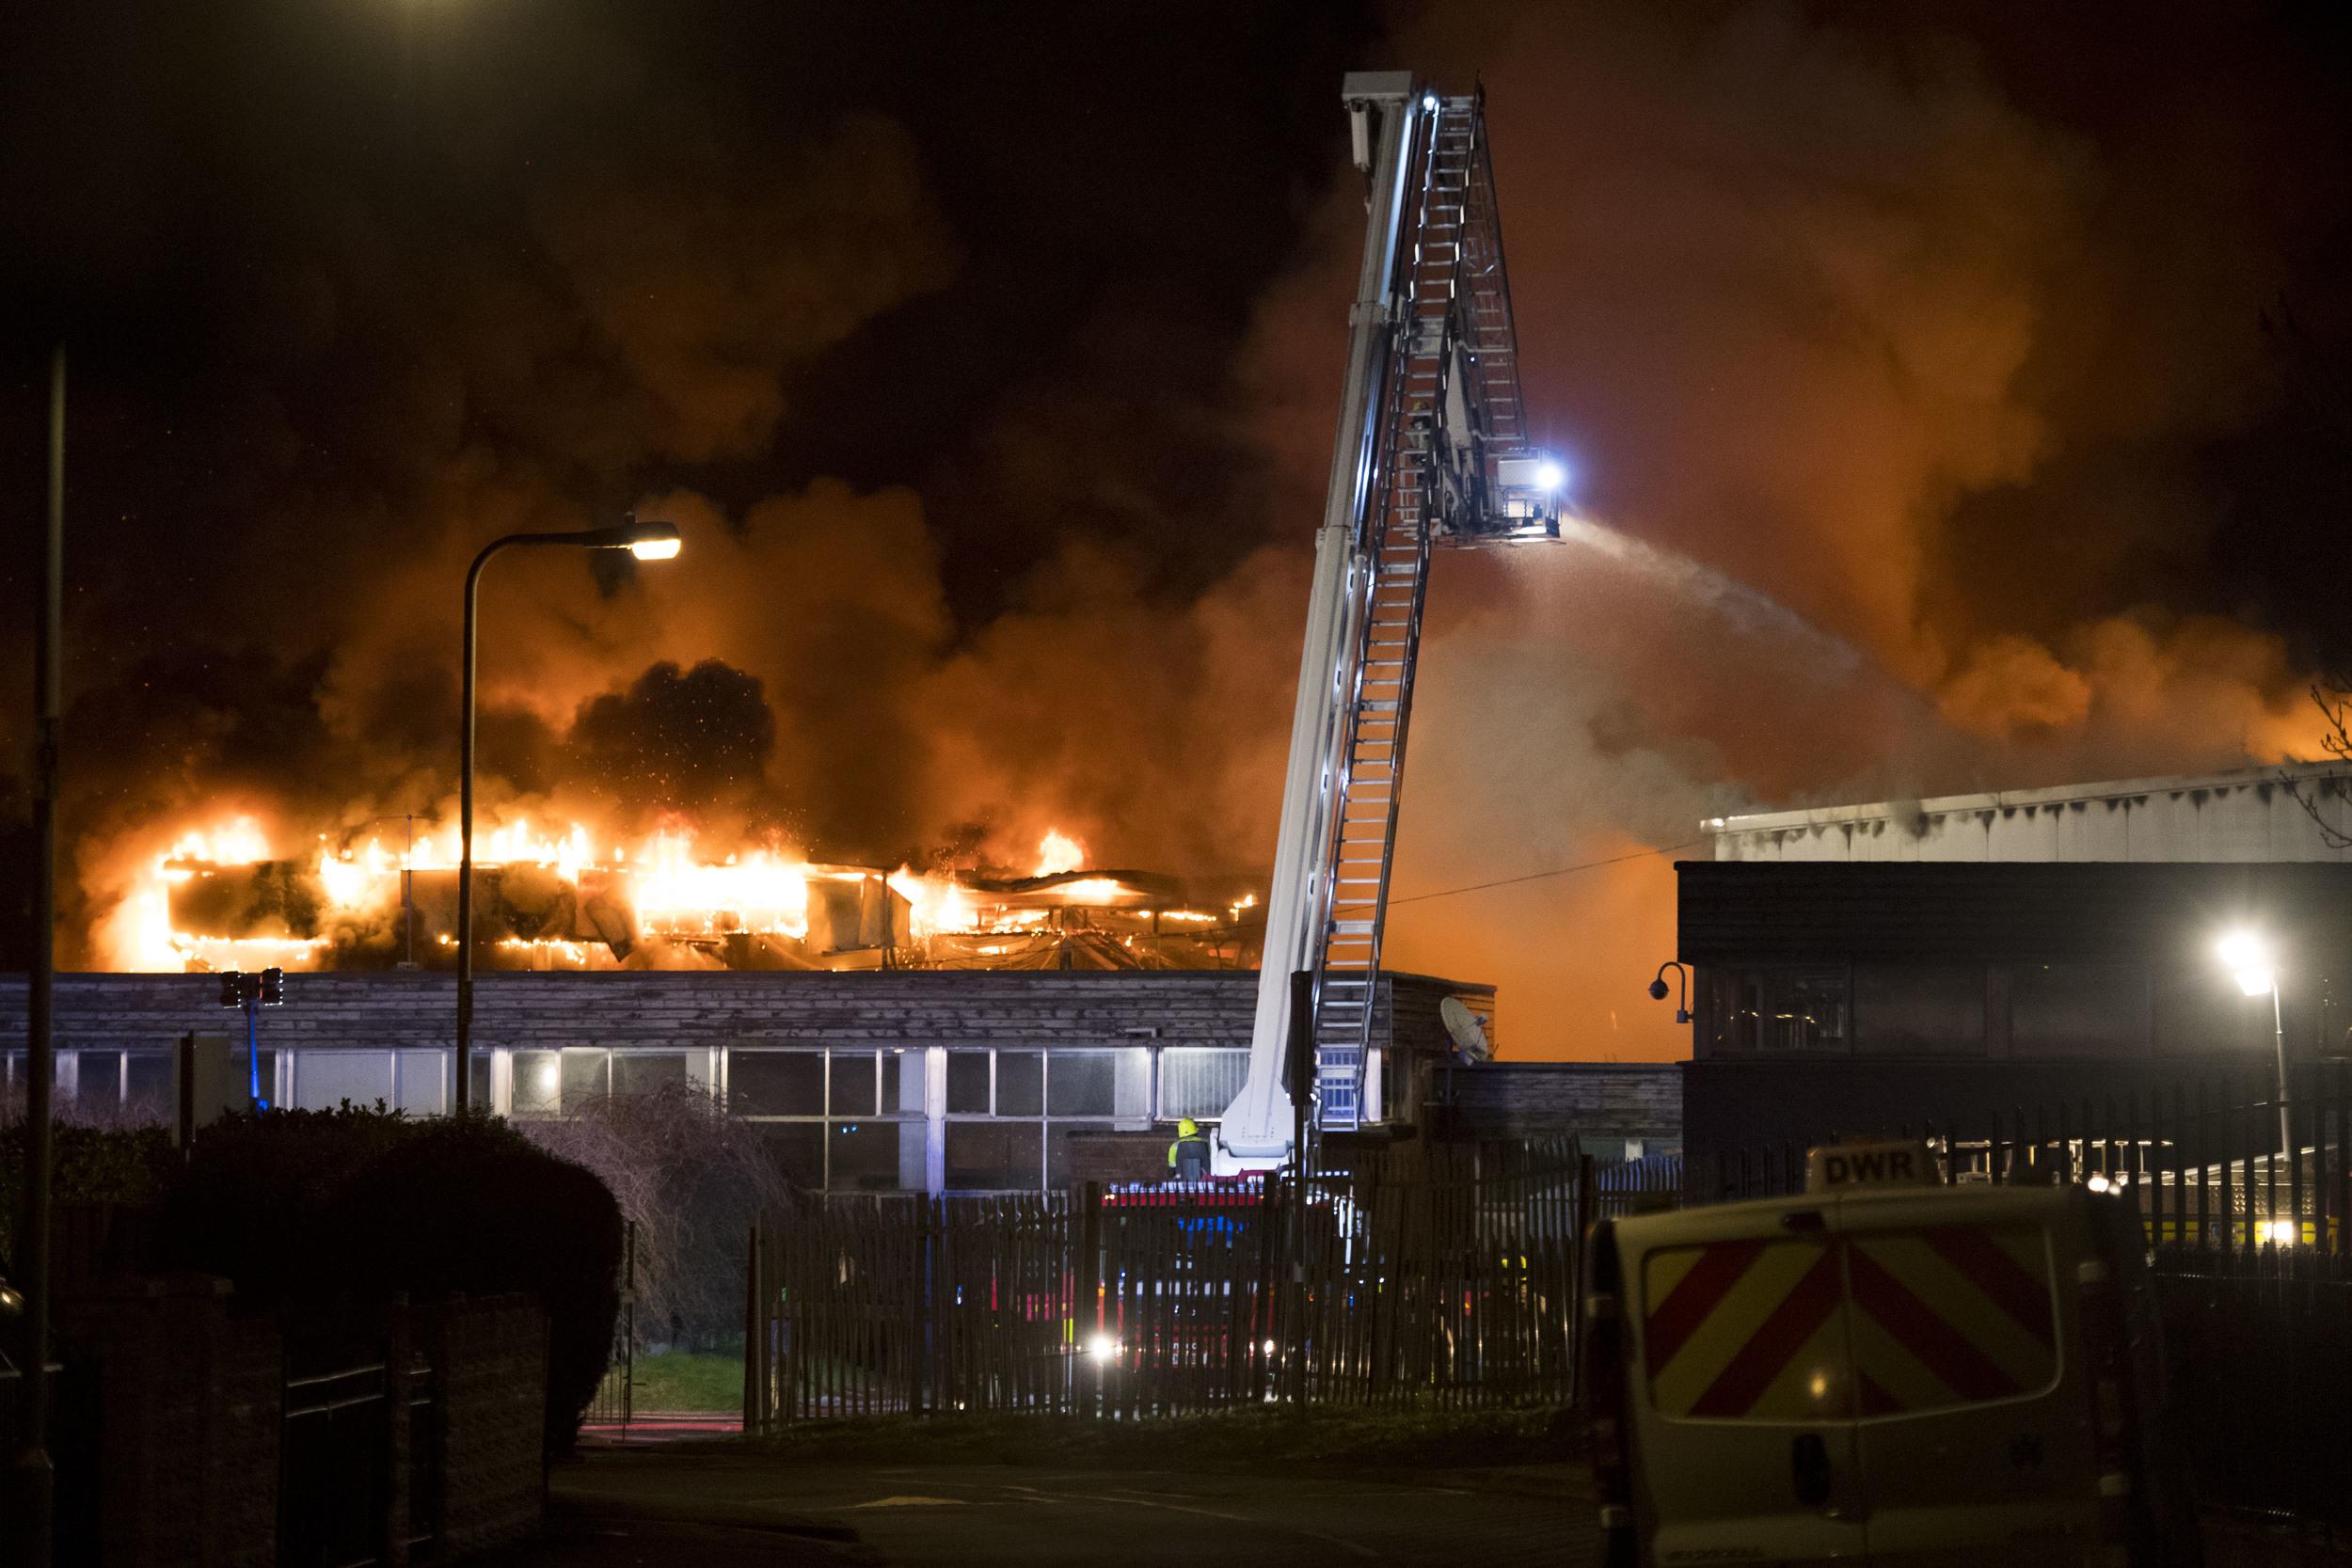 Fire at Glyn Derw High School, Ely. (Photo by Matthew Horwood)